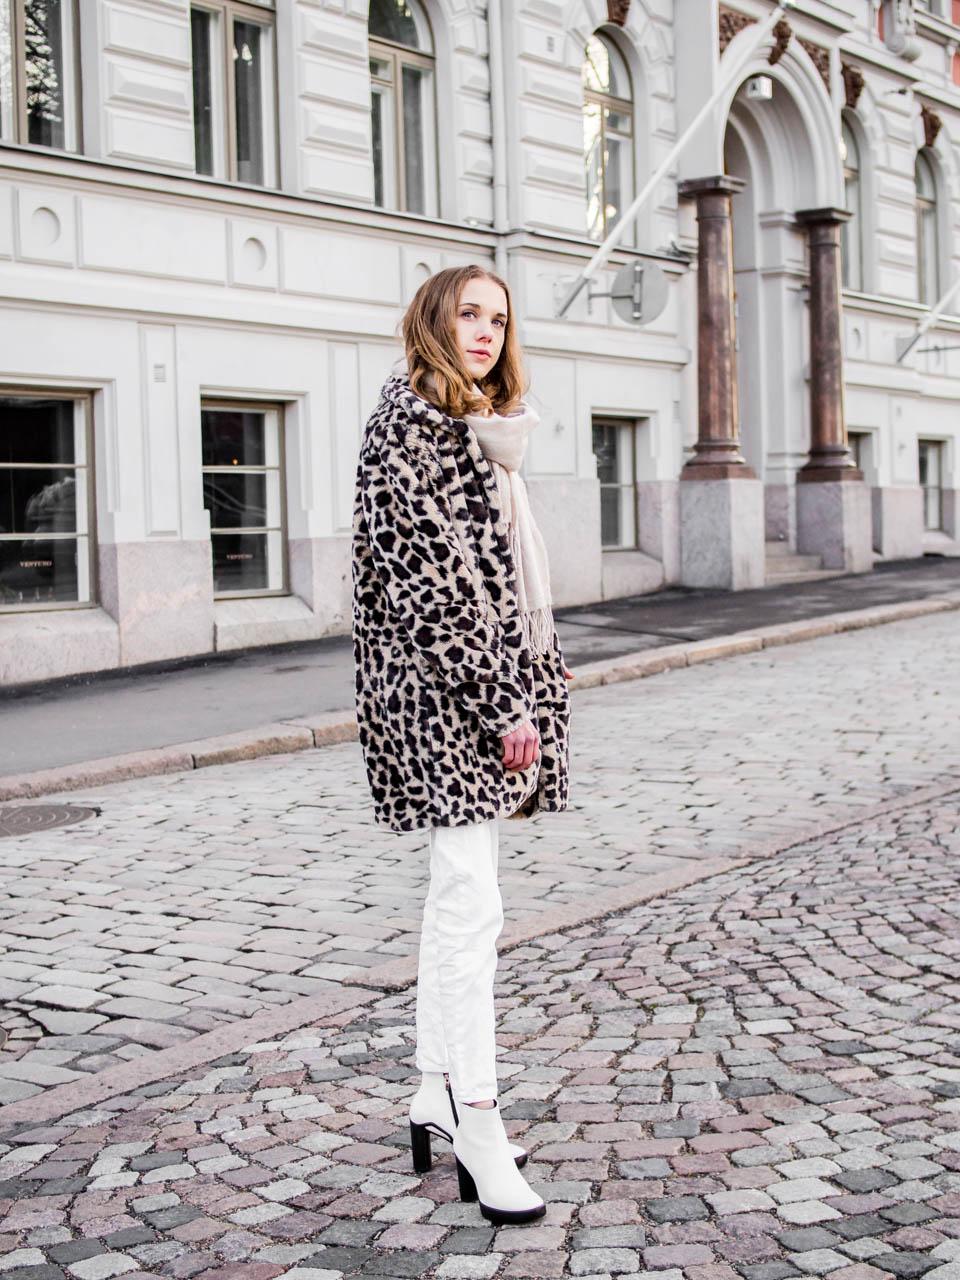 Scandinavian fashion blogger winter street style - Talvimuoti, muotiblogi, Helsinki